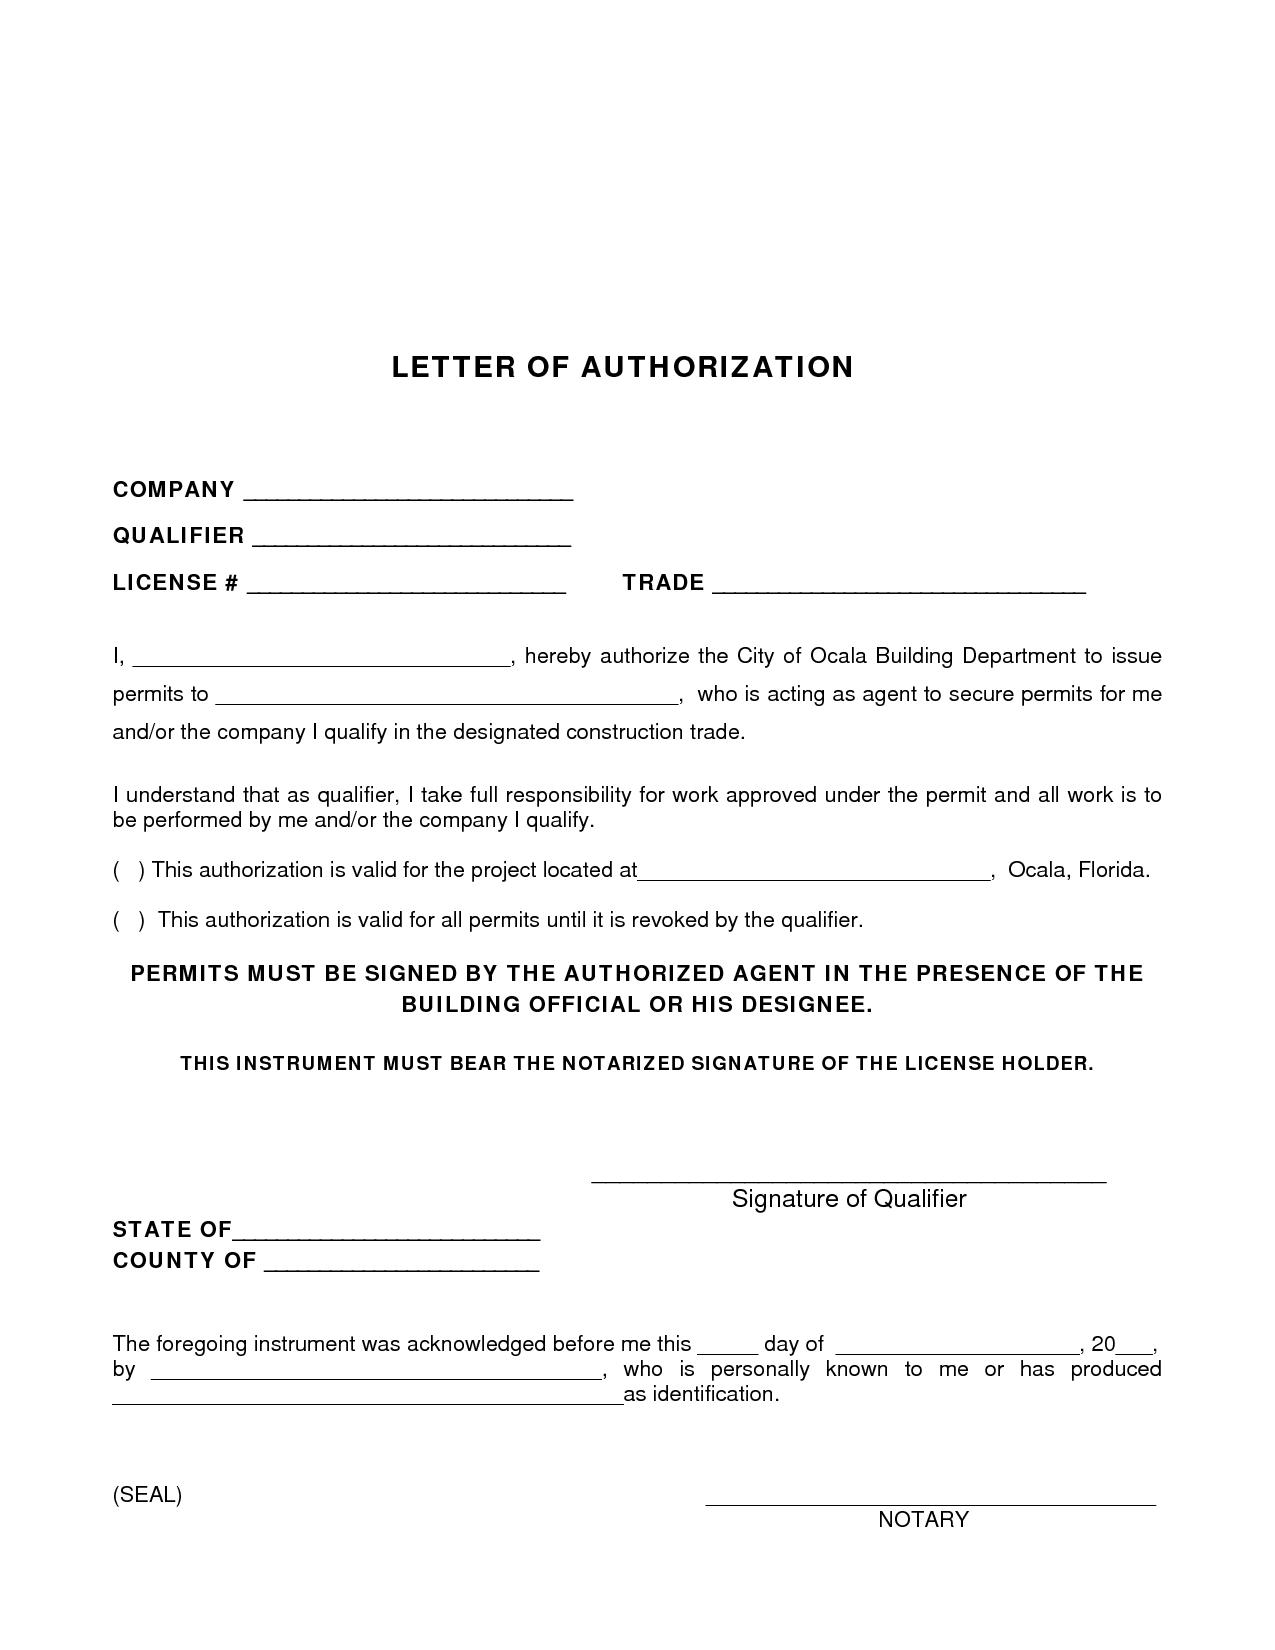 Authorization letter template datariouruguay spiritdancerdesigns Images